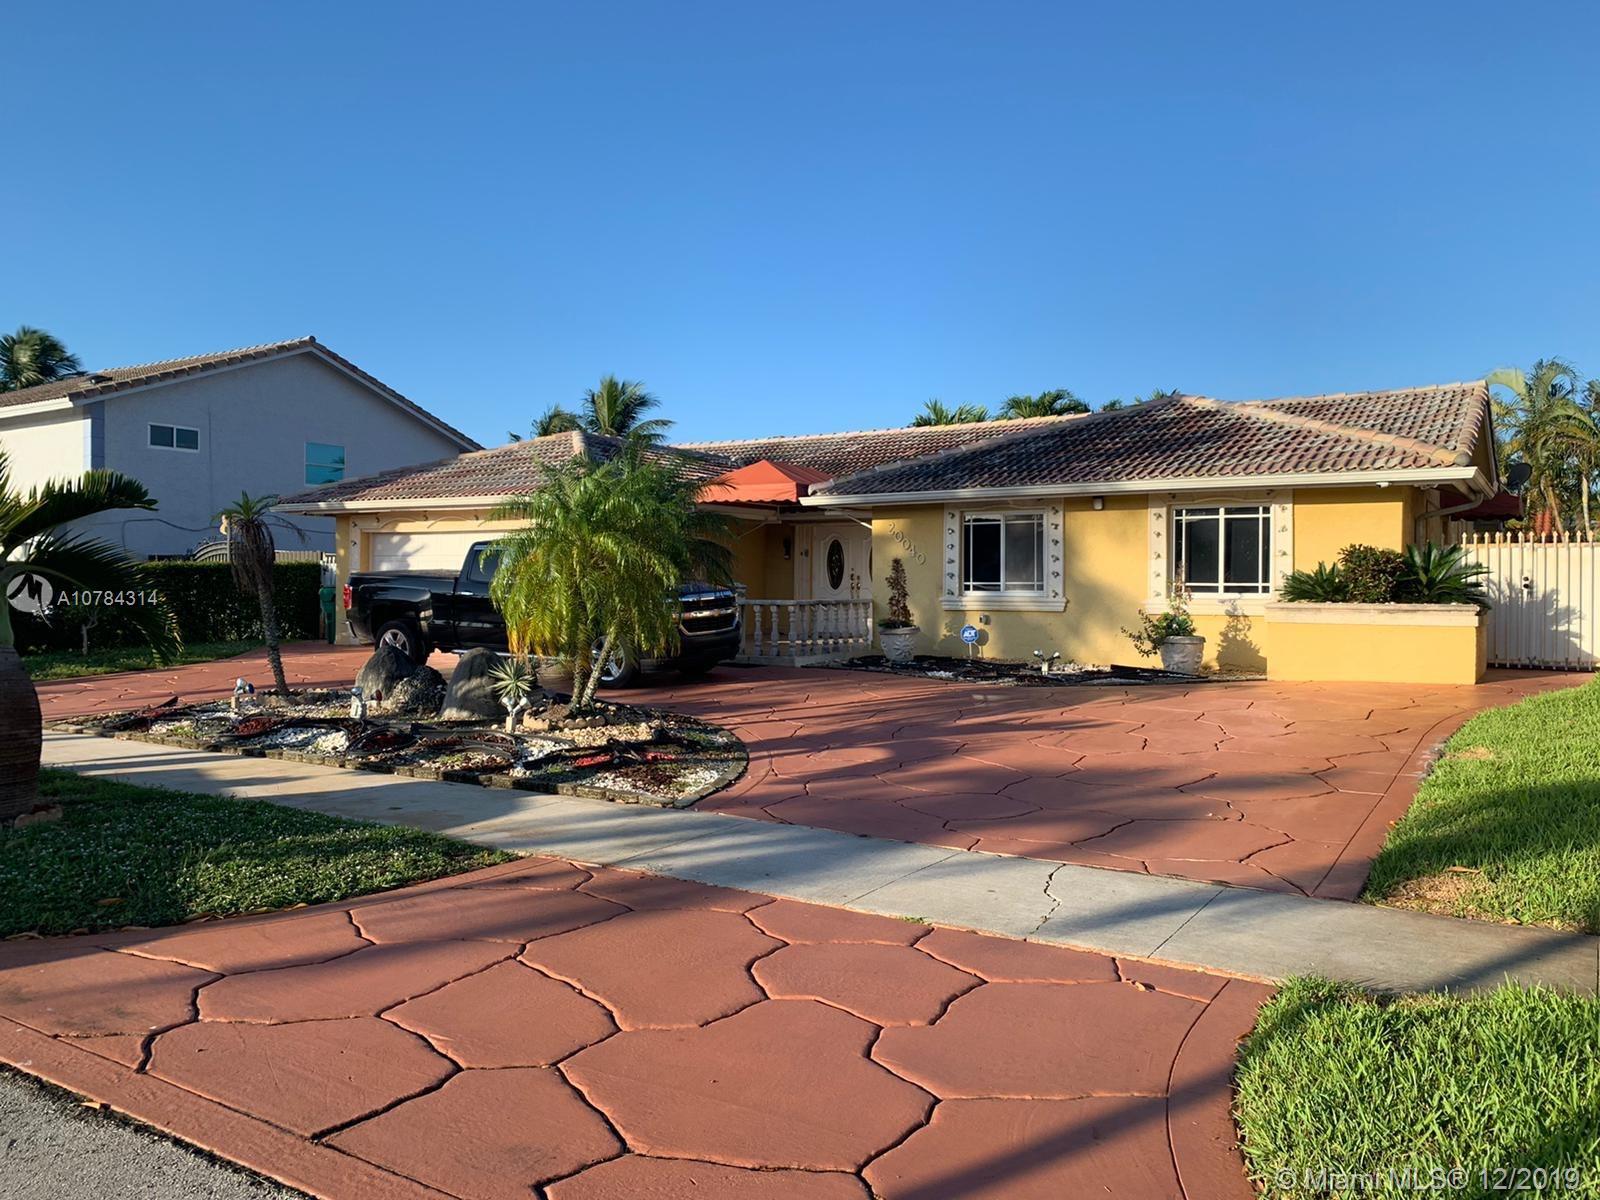 20040 NW 63rd ave, Hialeah, FL 33015 - Hialeah, FL real estate listing